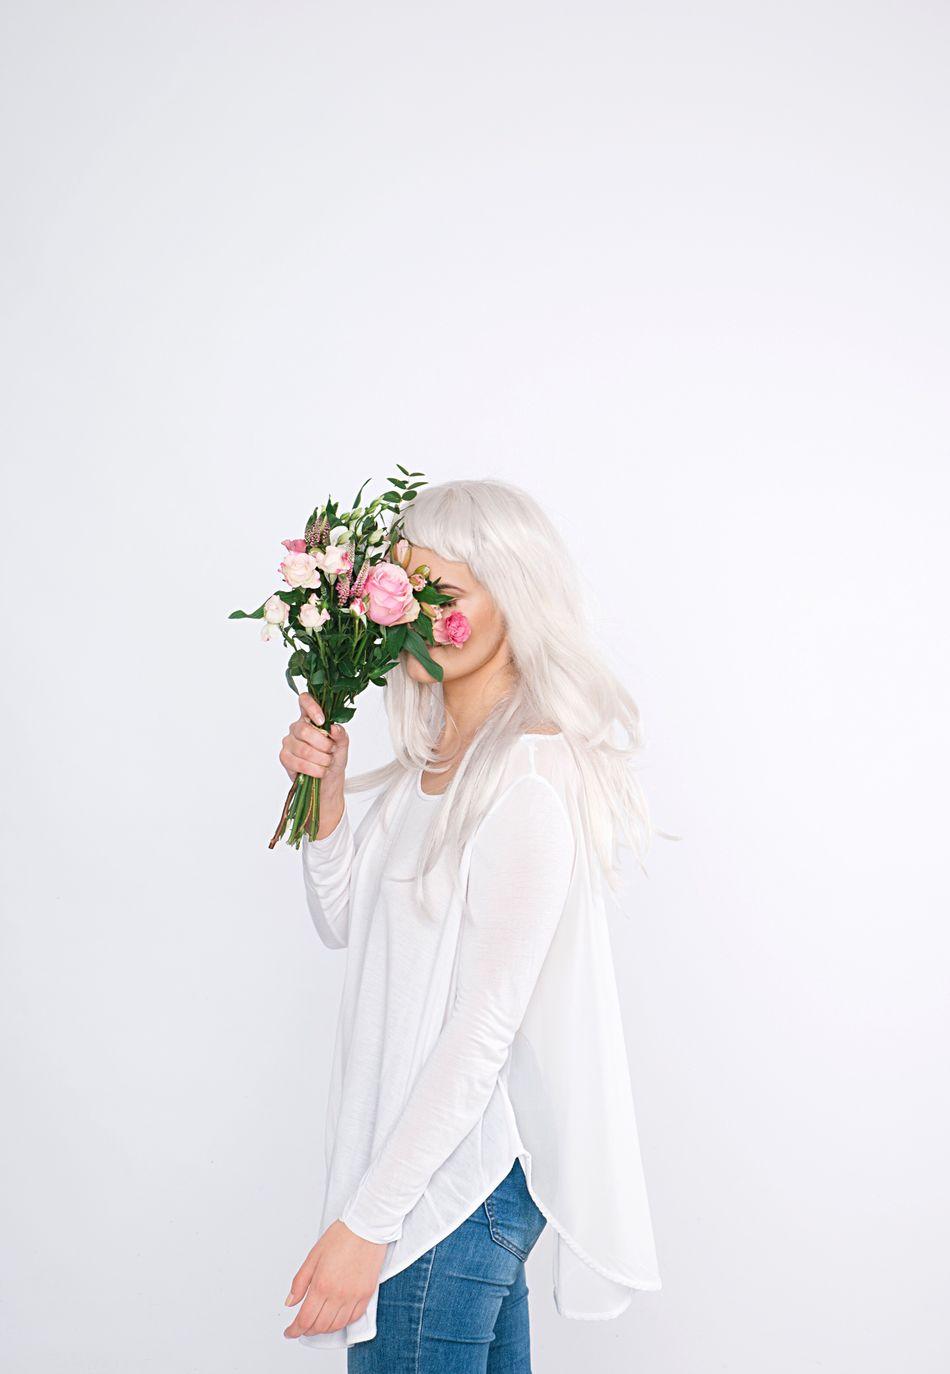 Beautiful stock photos of blumen, flower, studio shot, white background, only women